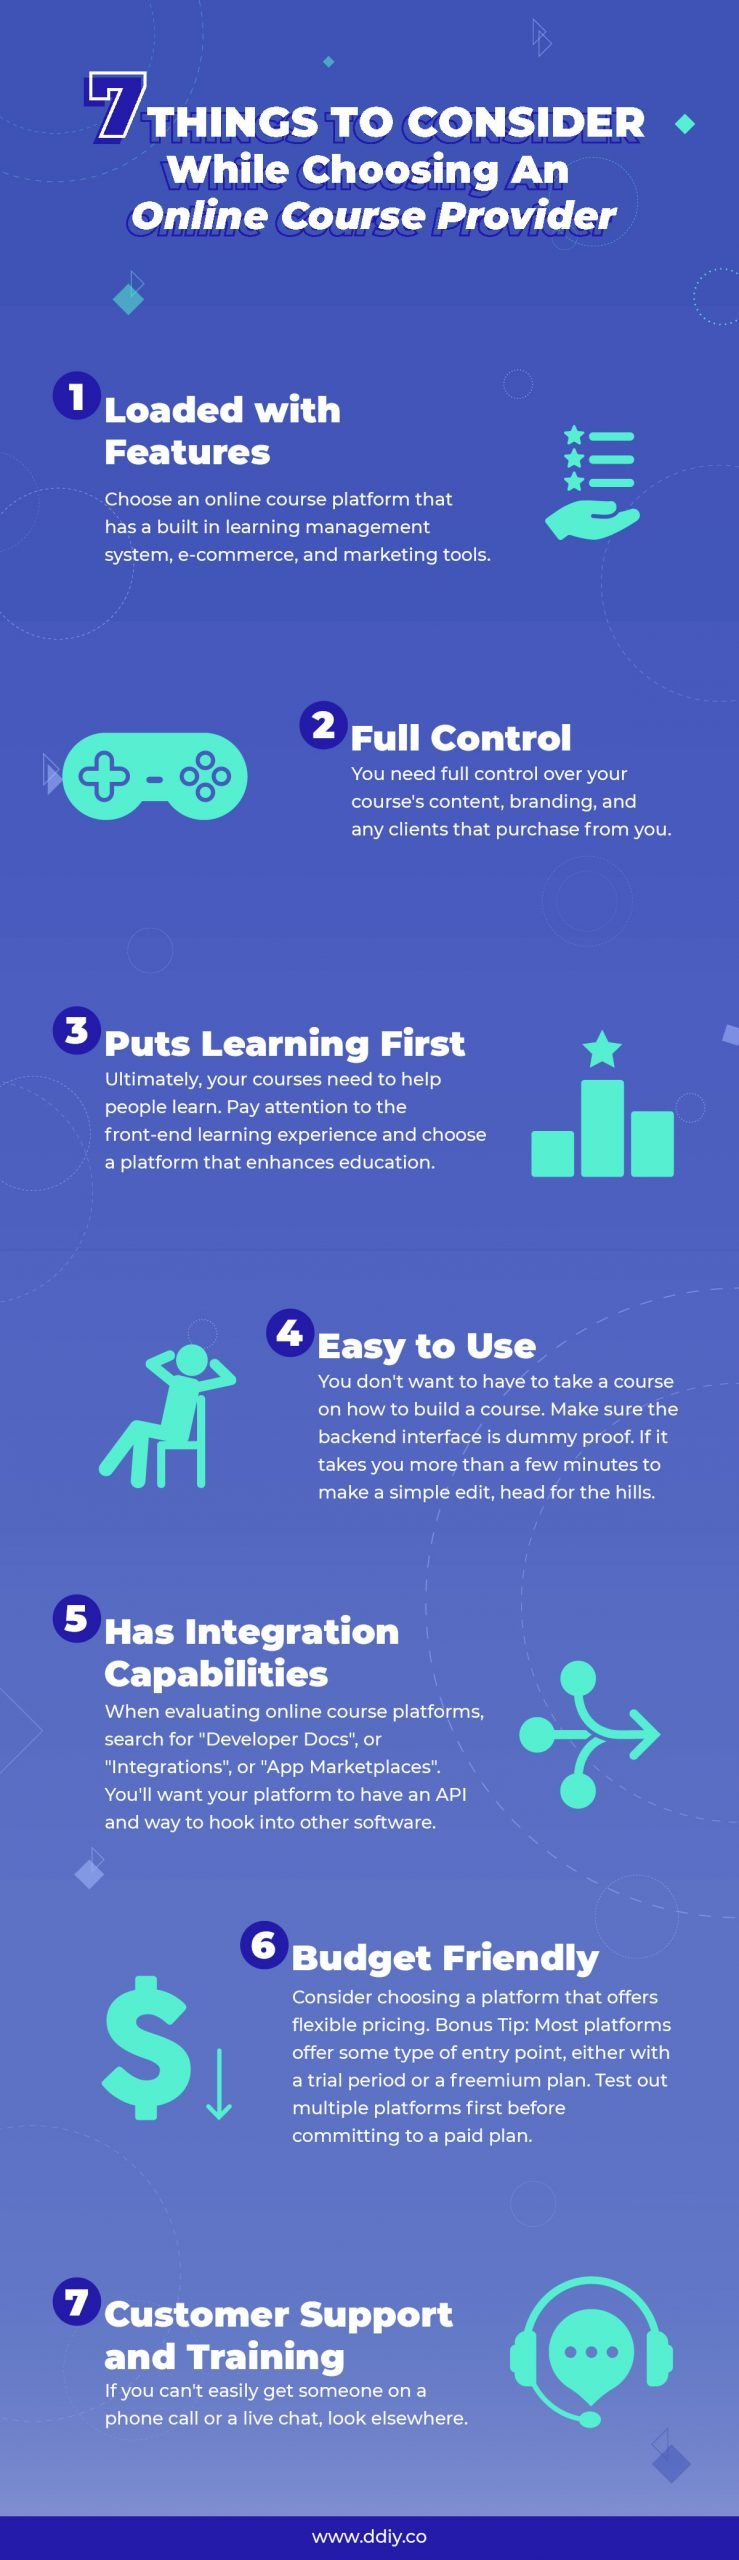 Online Course Comparison Guide Infographic